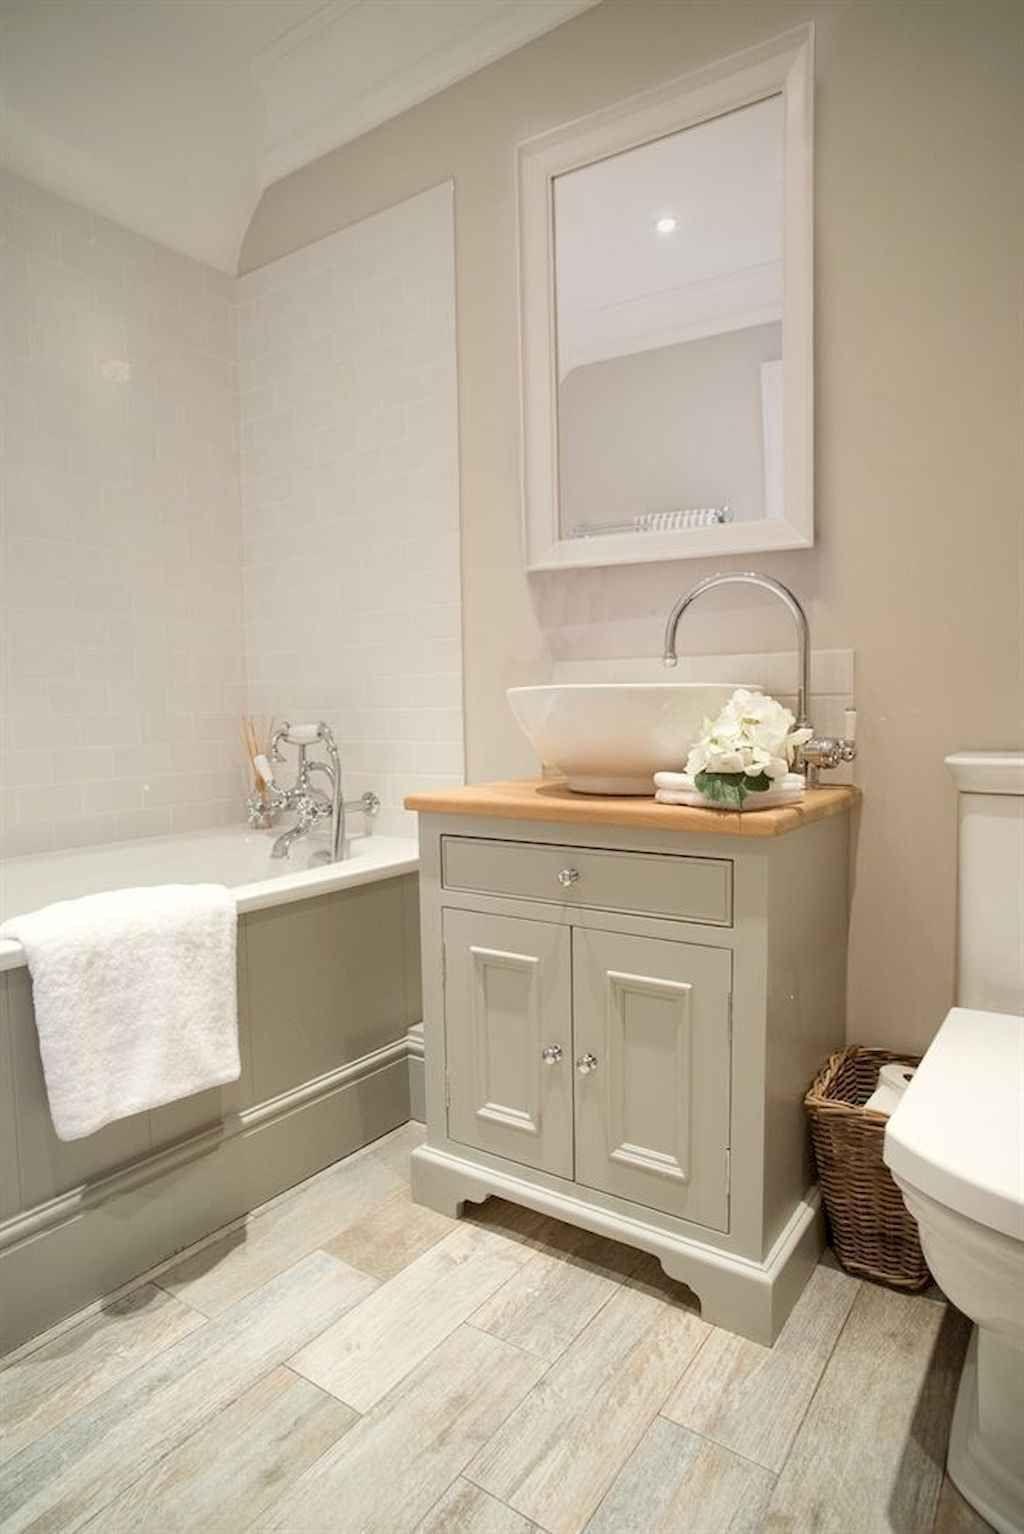 80 cool small bathroom remodel ideas  small bathroom